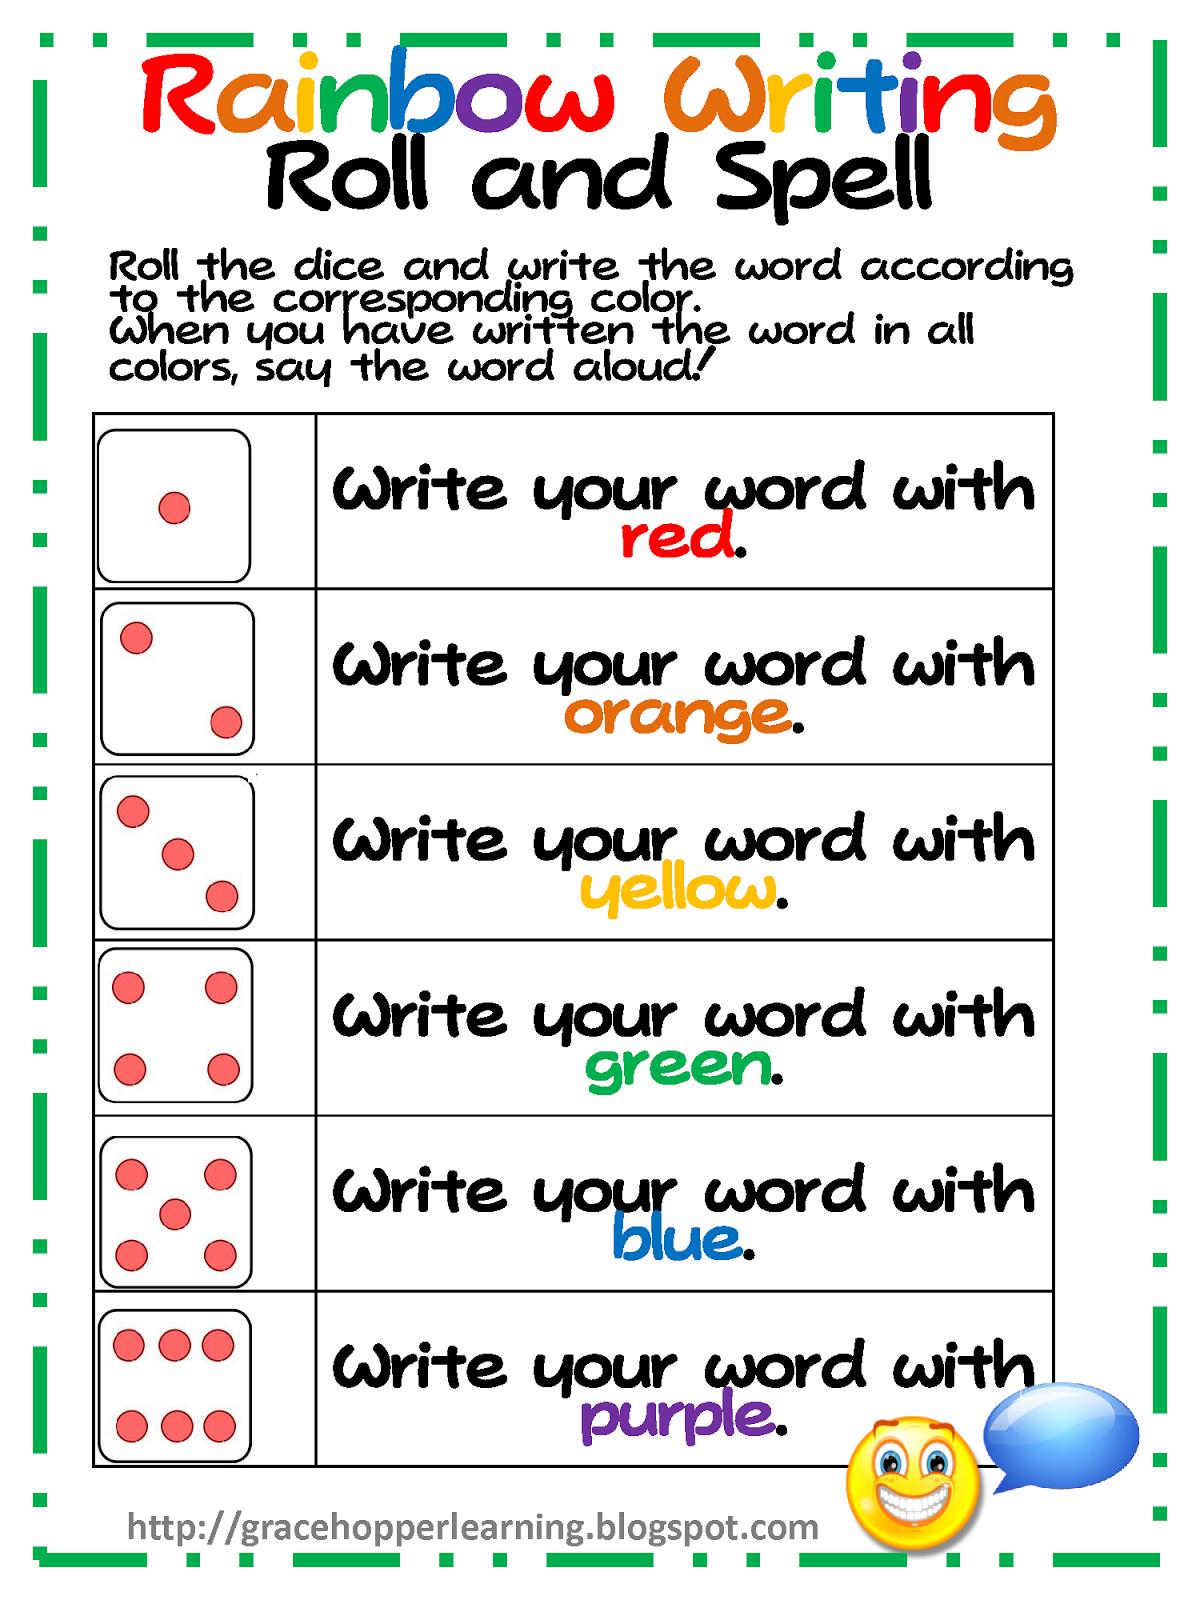 Do you like writing stories?